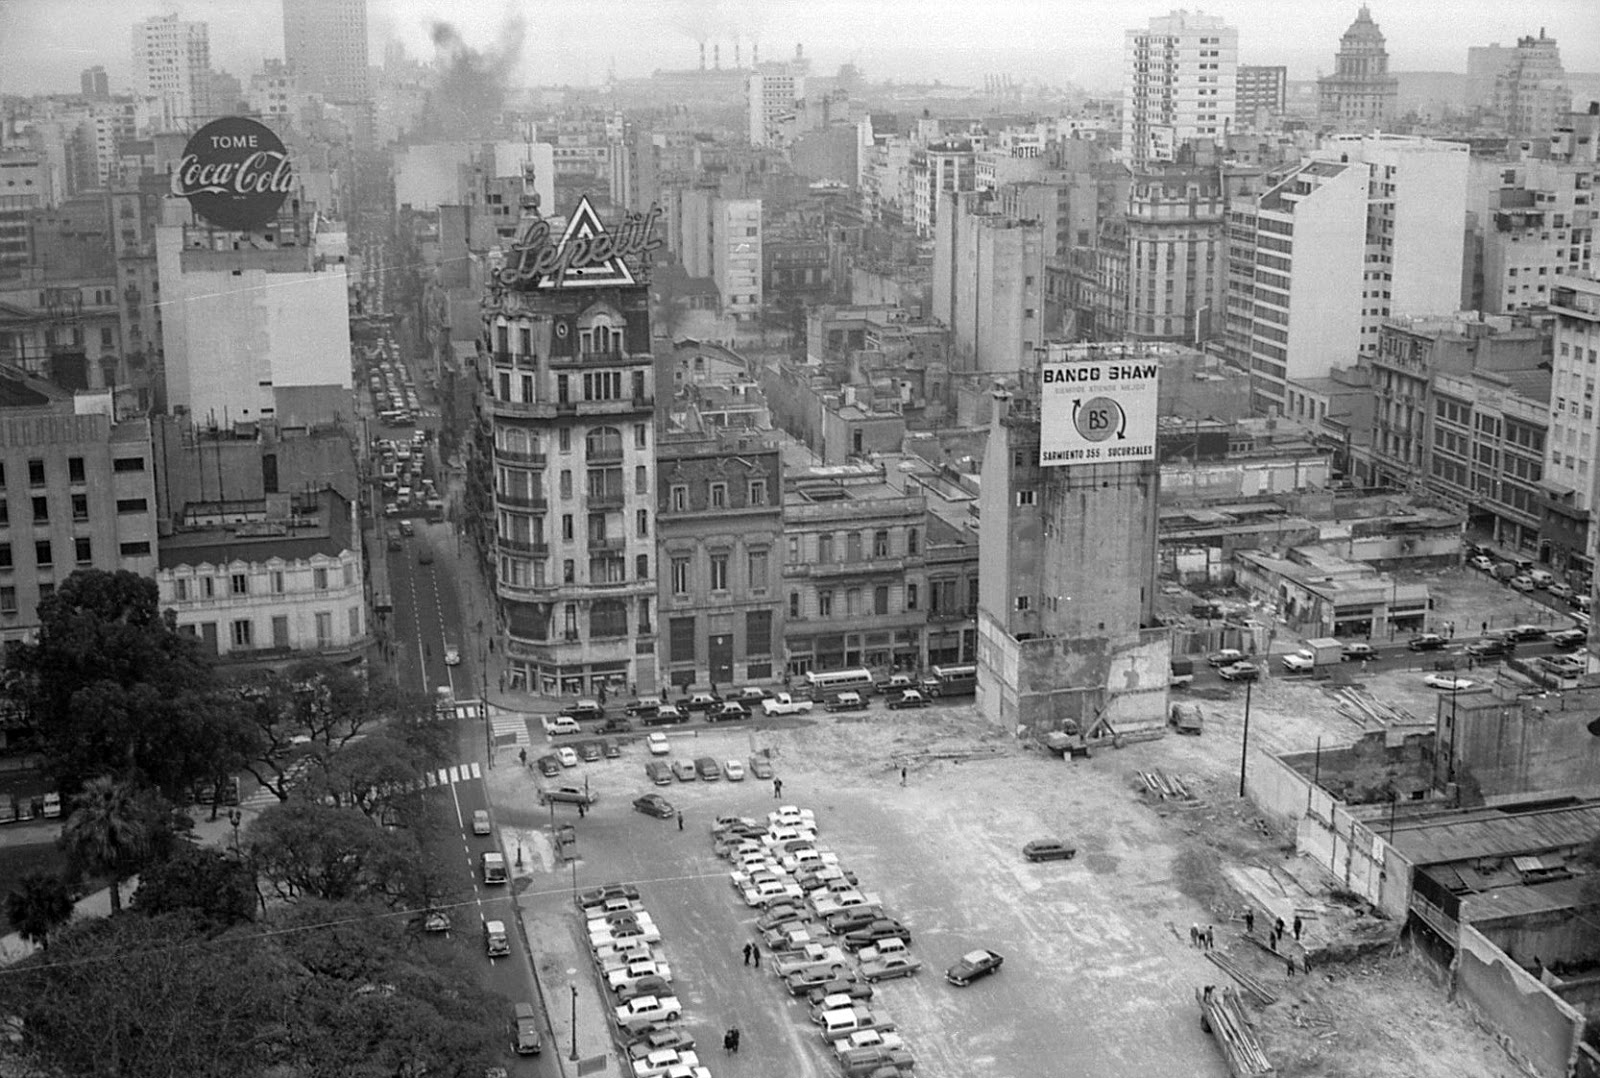 Historia digital enciclopedia fotogr fica october 2013 for Hoteles en marcelo t de alvear buenos aires